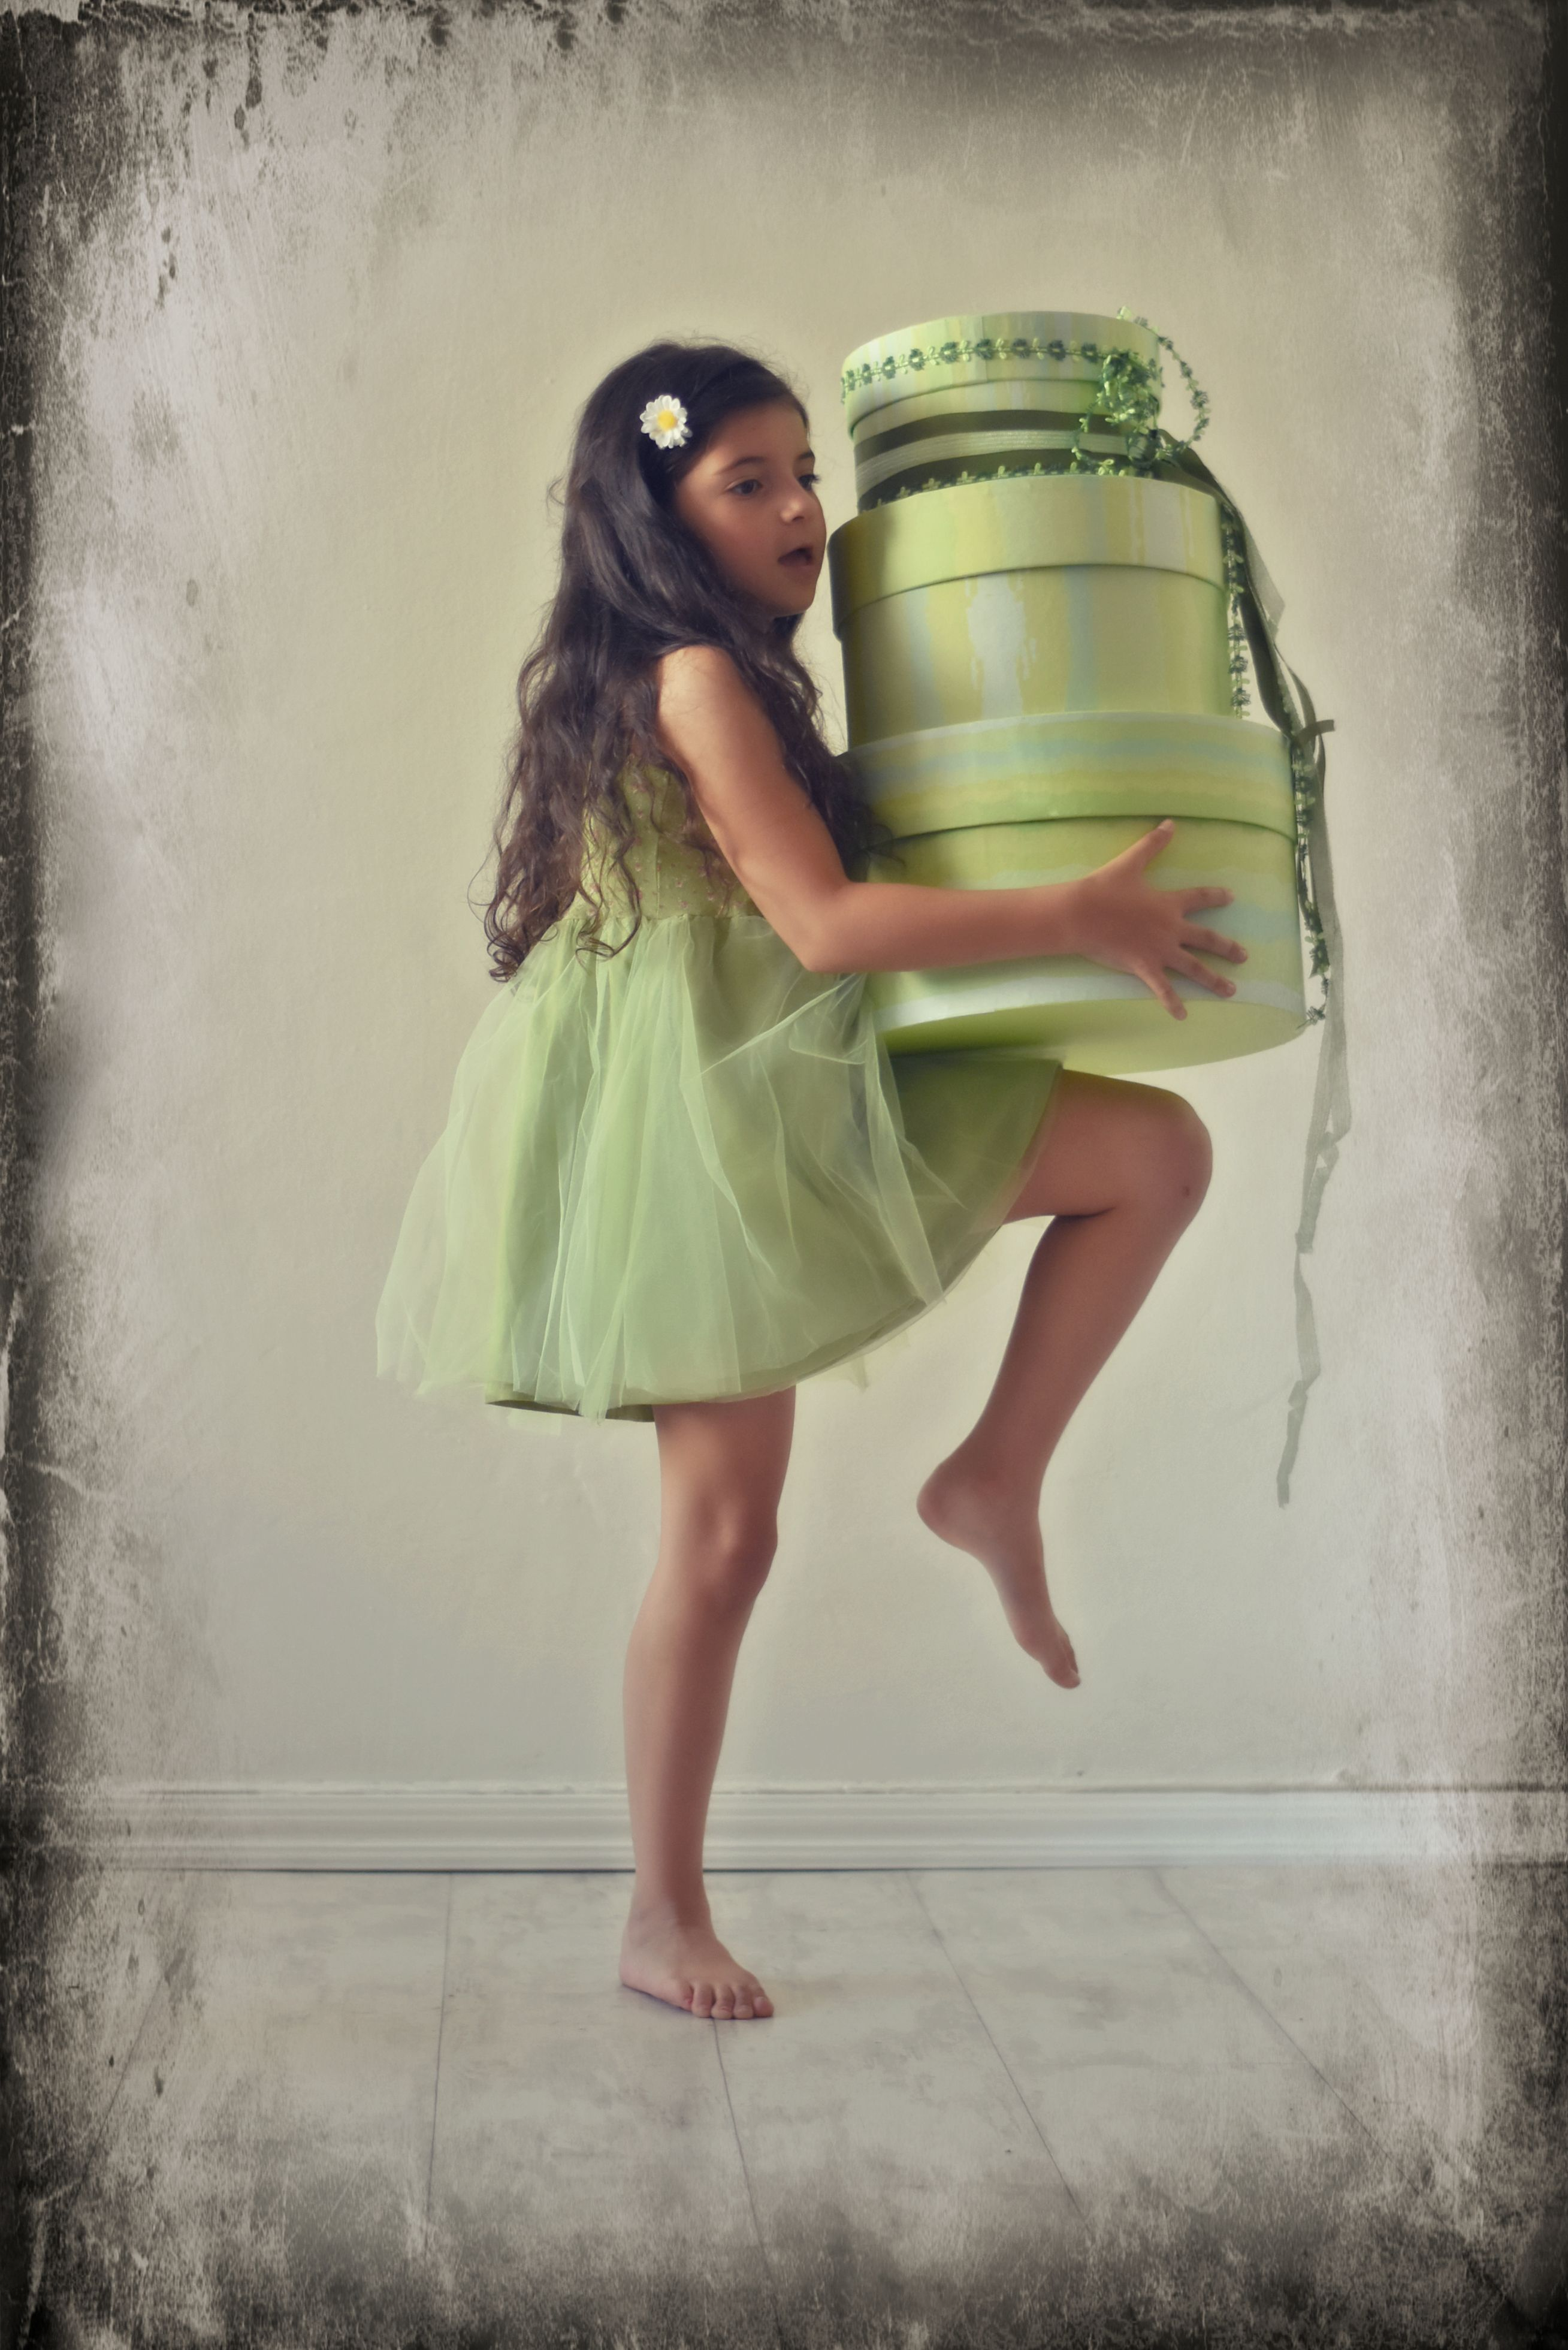 Pin By Valerydesign Heilis On Photographyys Amp Girls